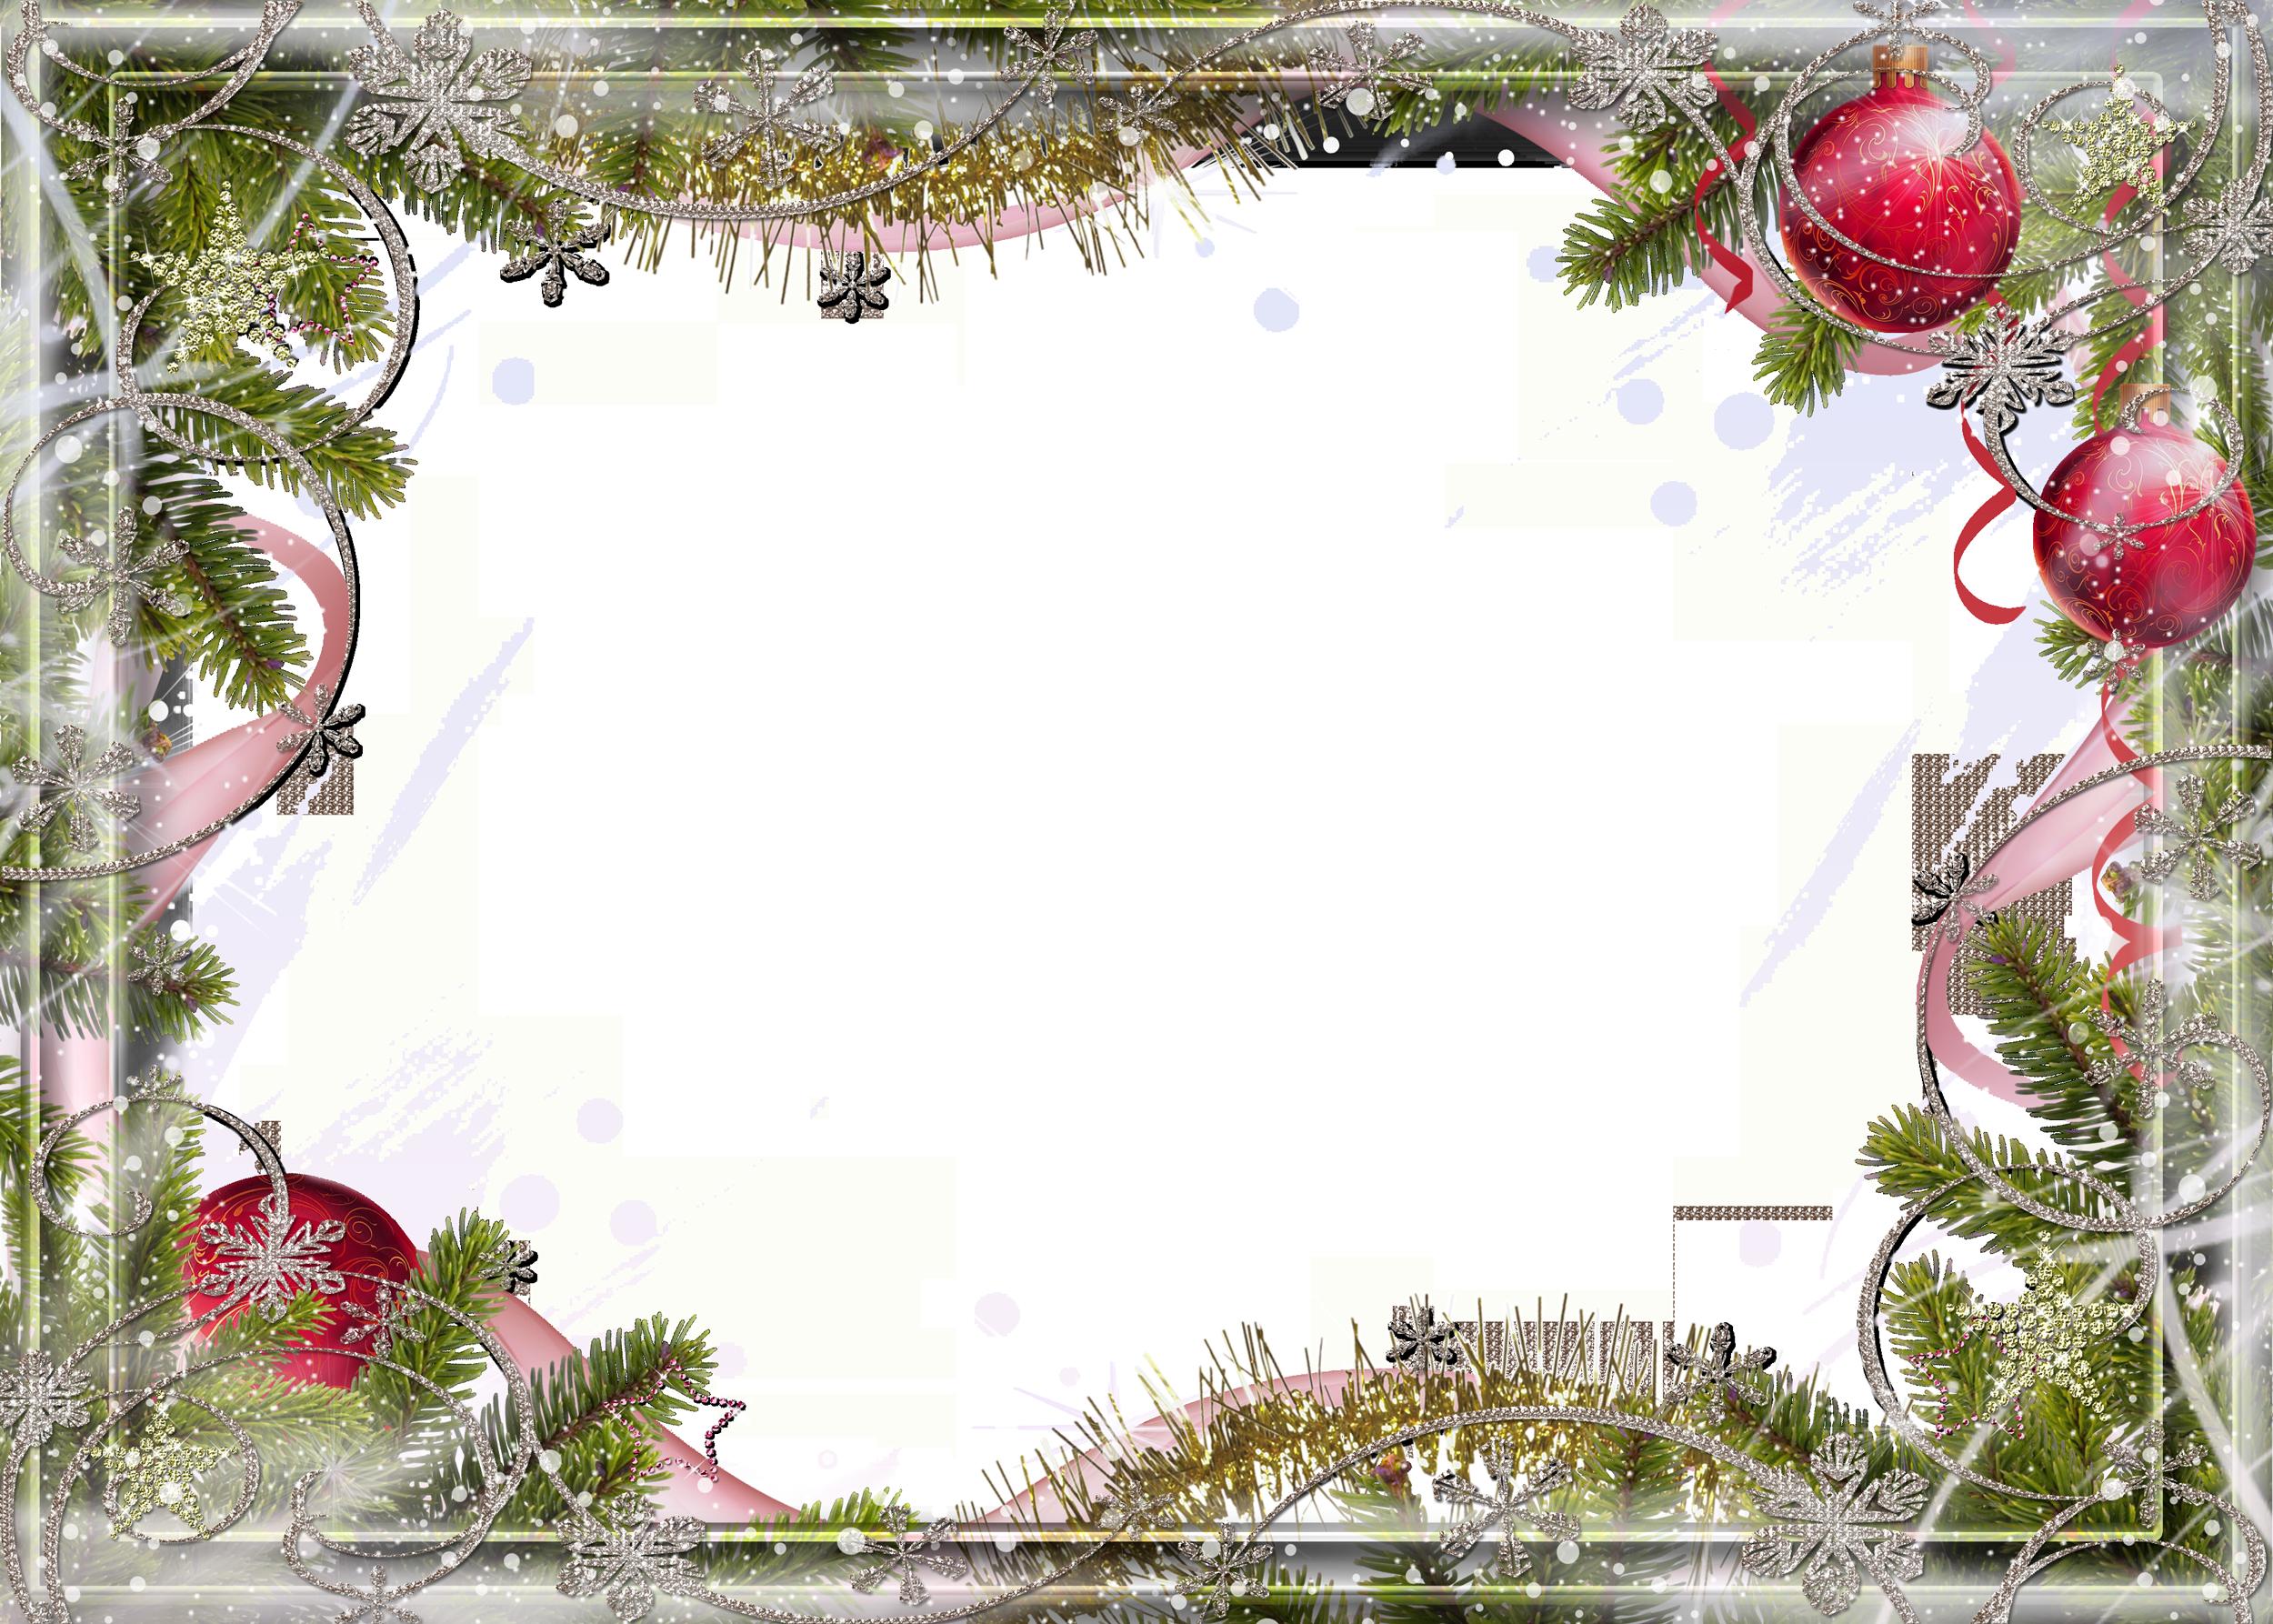 Рамка зимняя для открытки